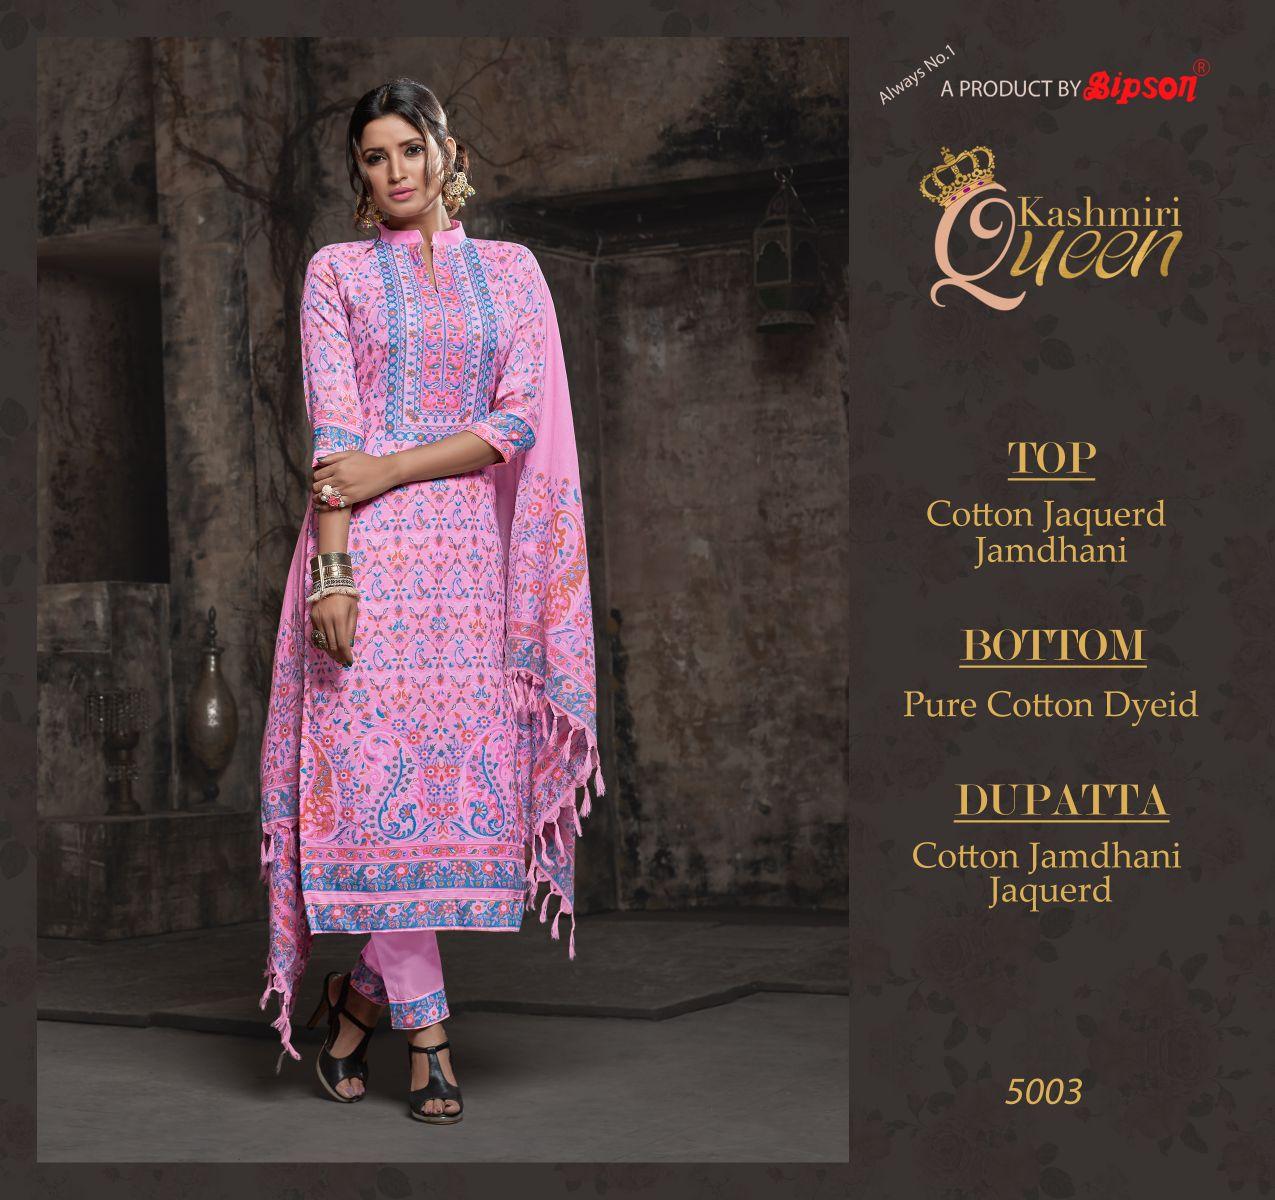 Bipson Kashmiri Queen 5003